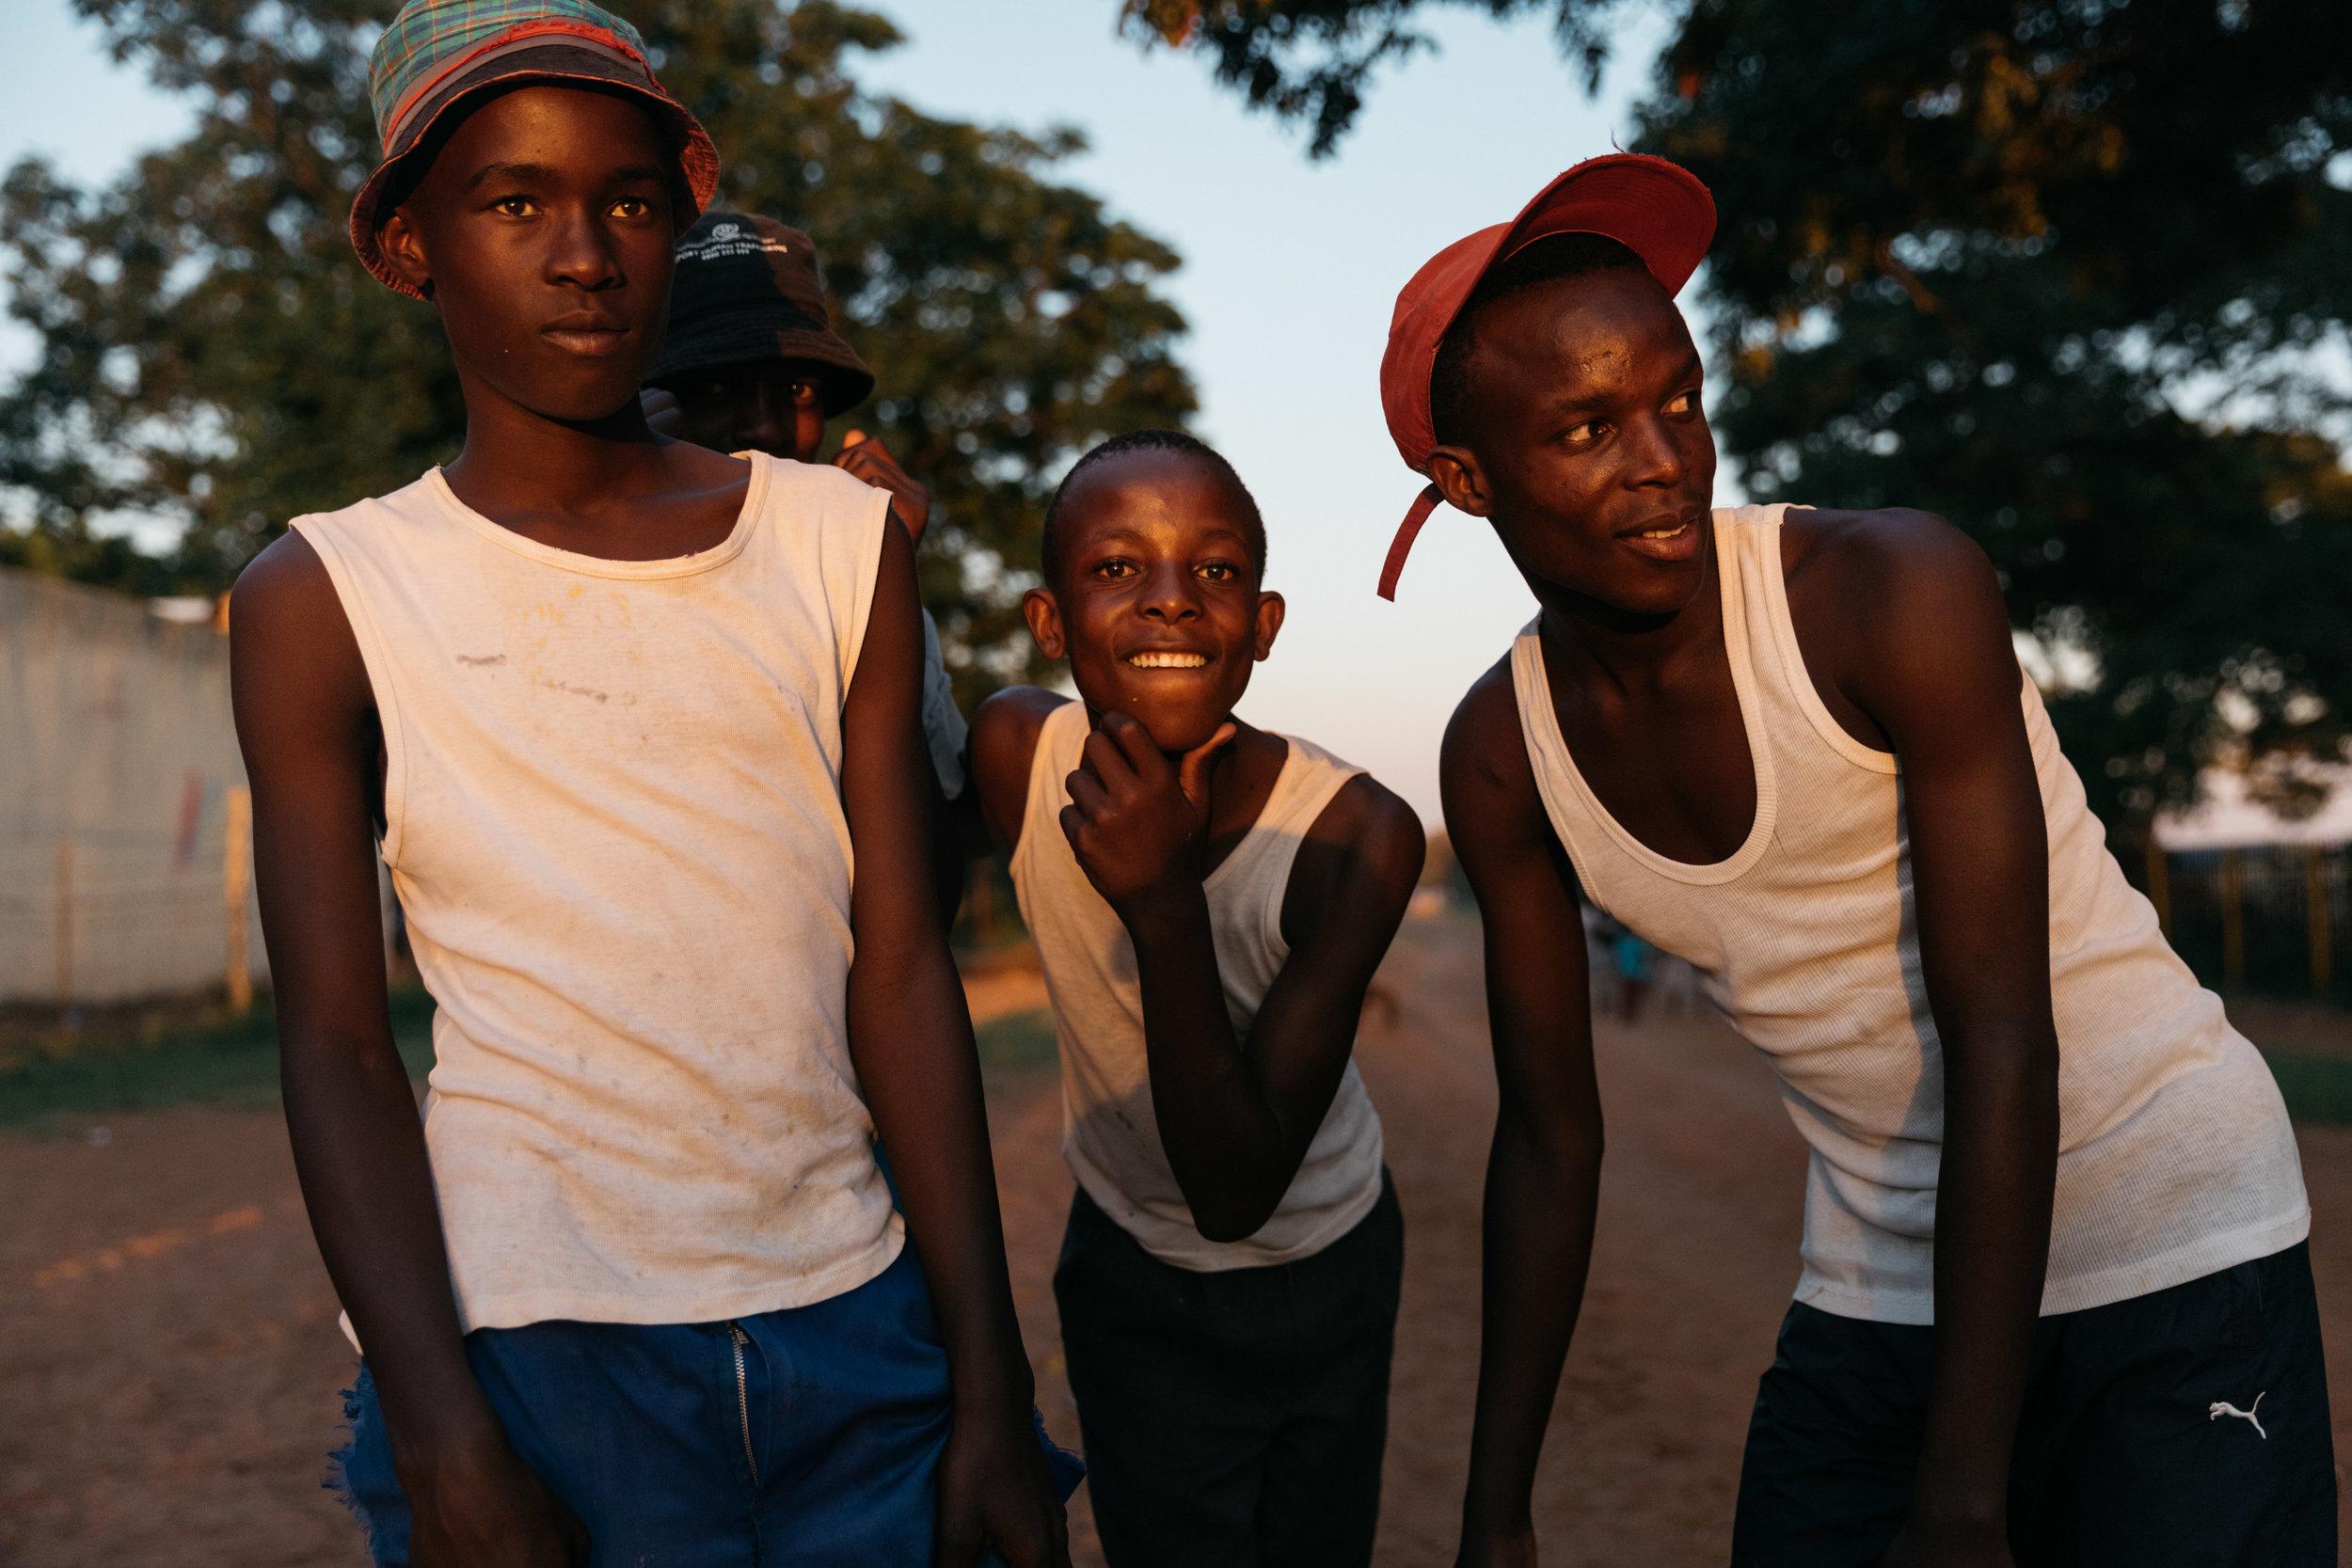 20170120-africa-9088-aqm.jpg